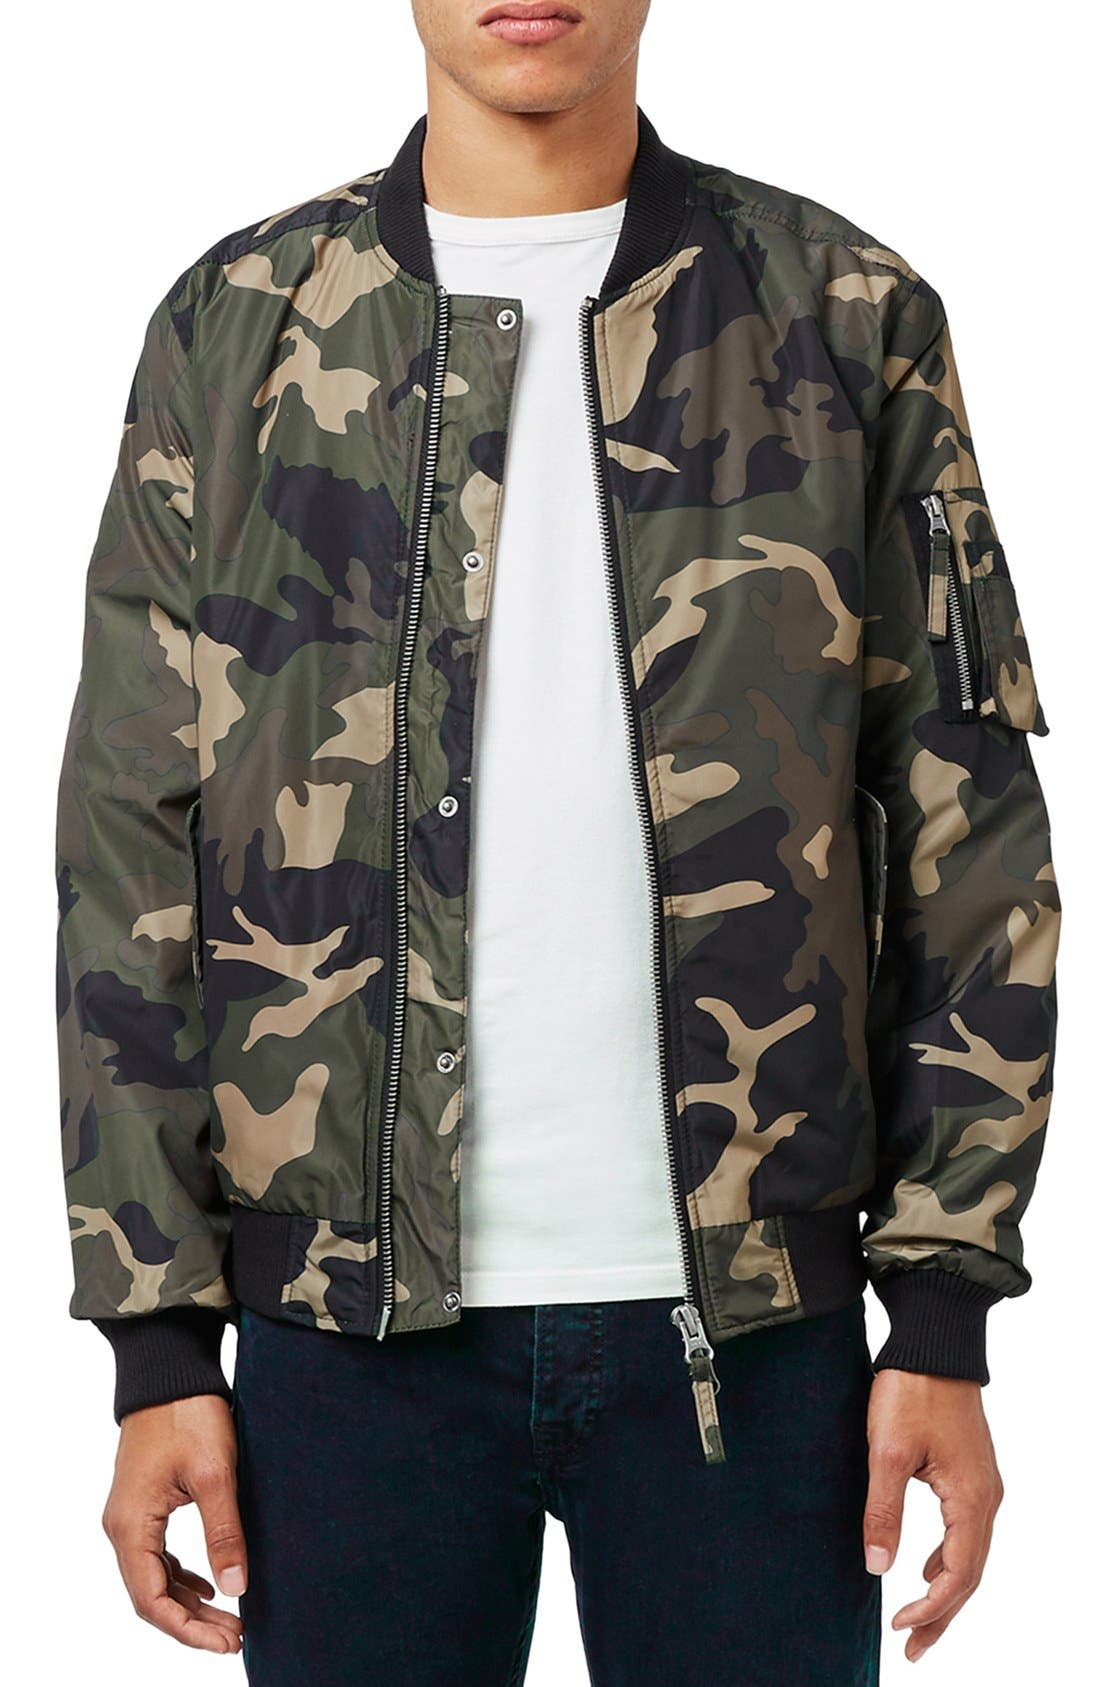 Alternate Image 1 Selected - Topman Camo Print MA-1 Bomber Jacket